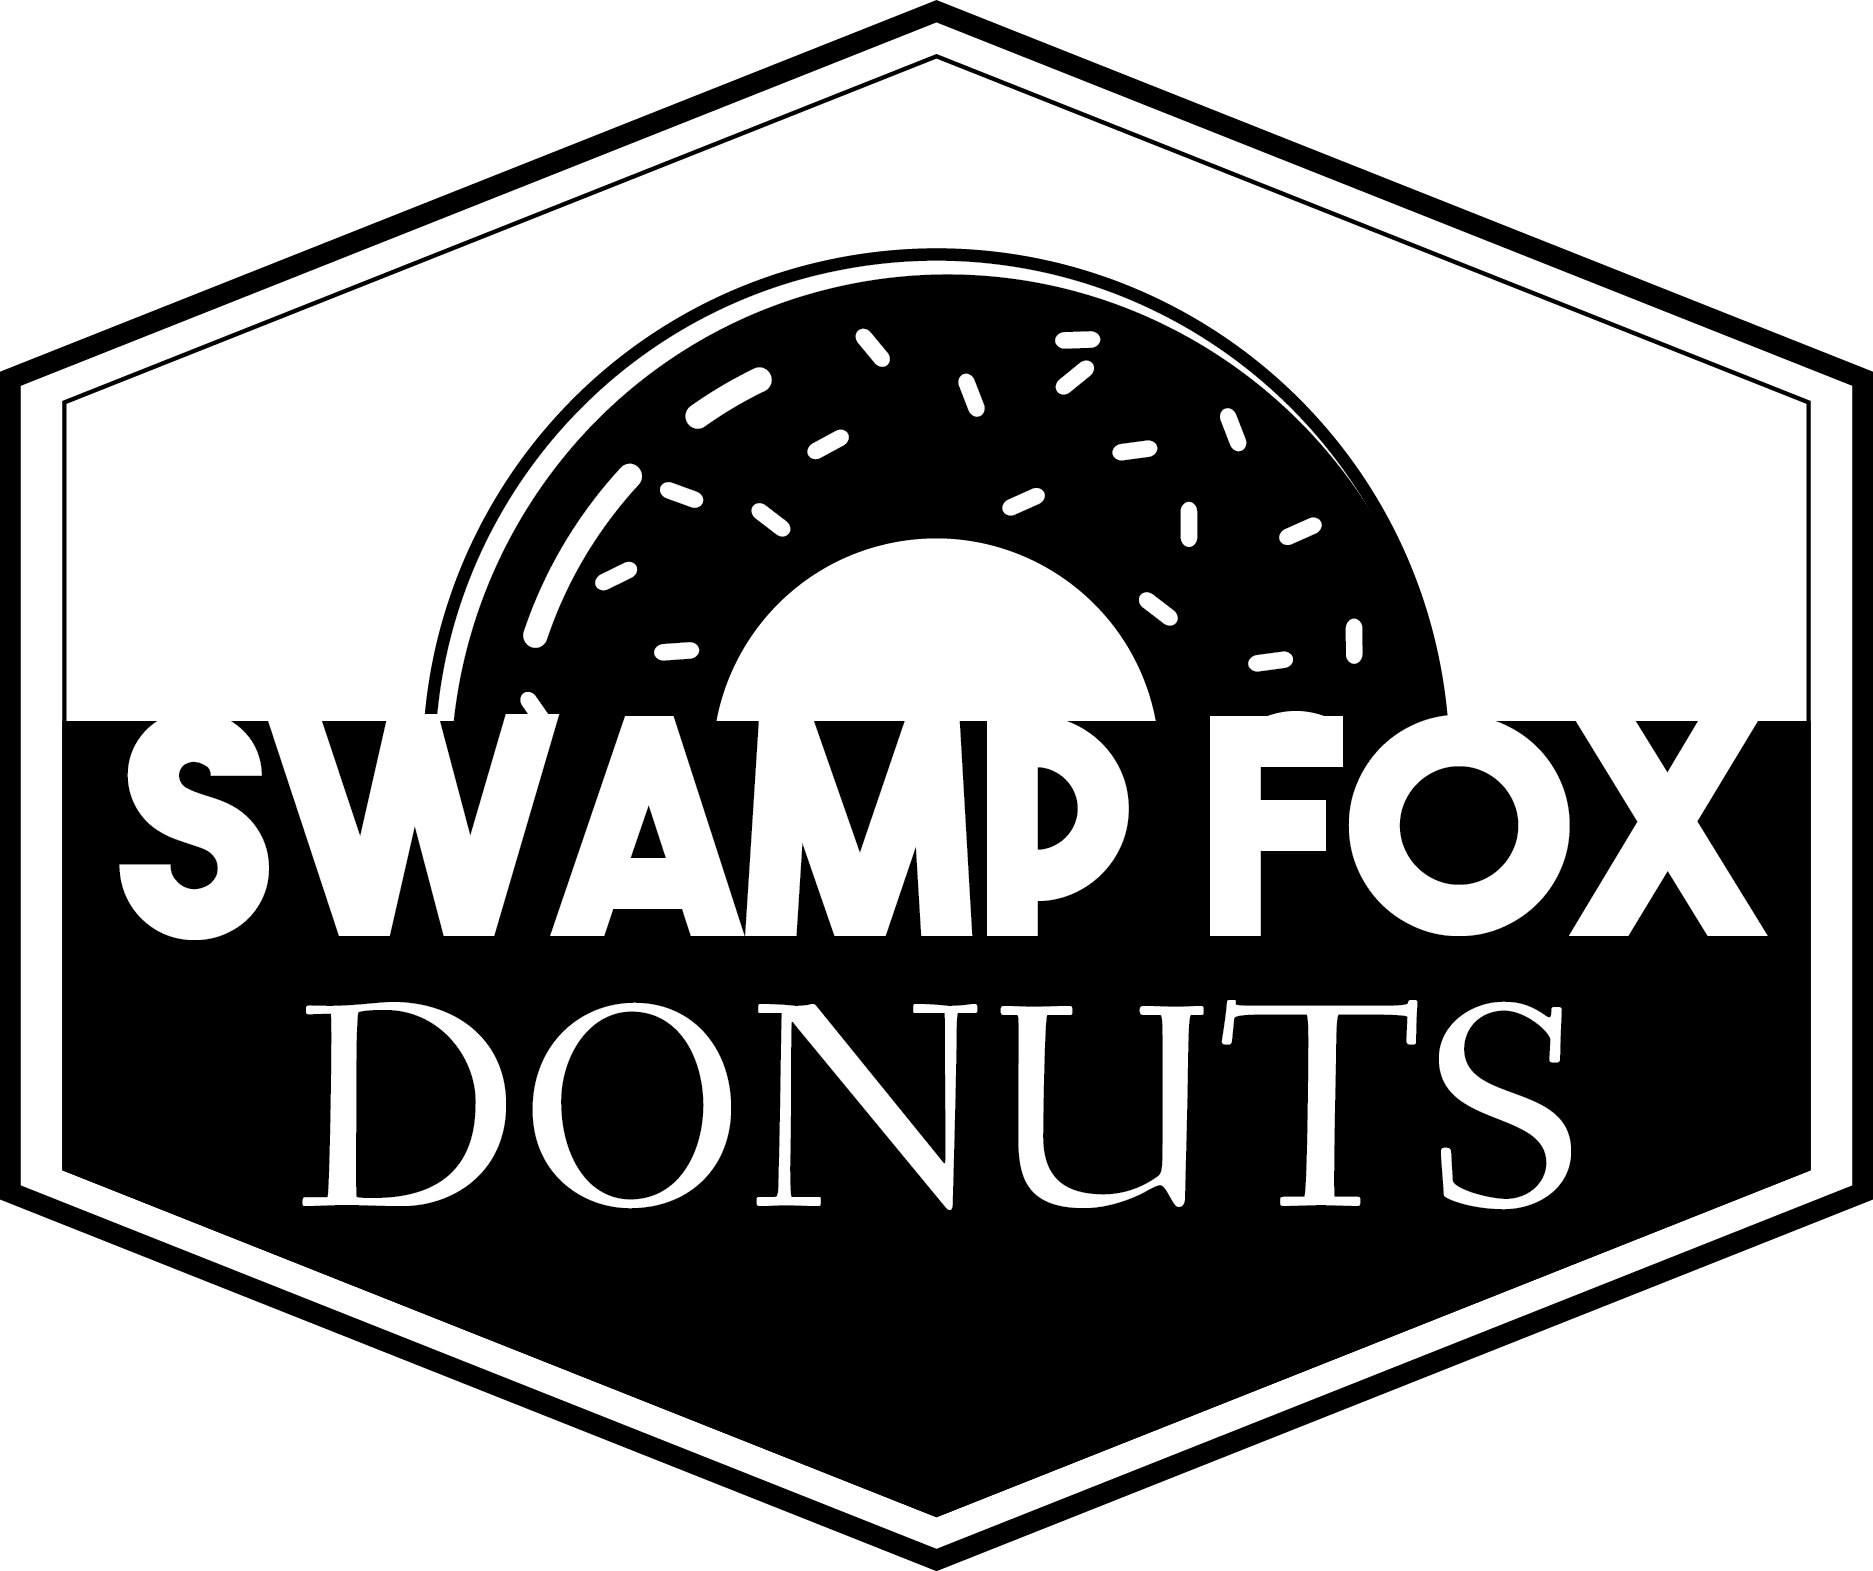 Swamp Fox Donuts